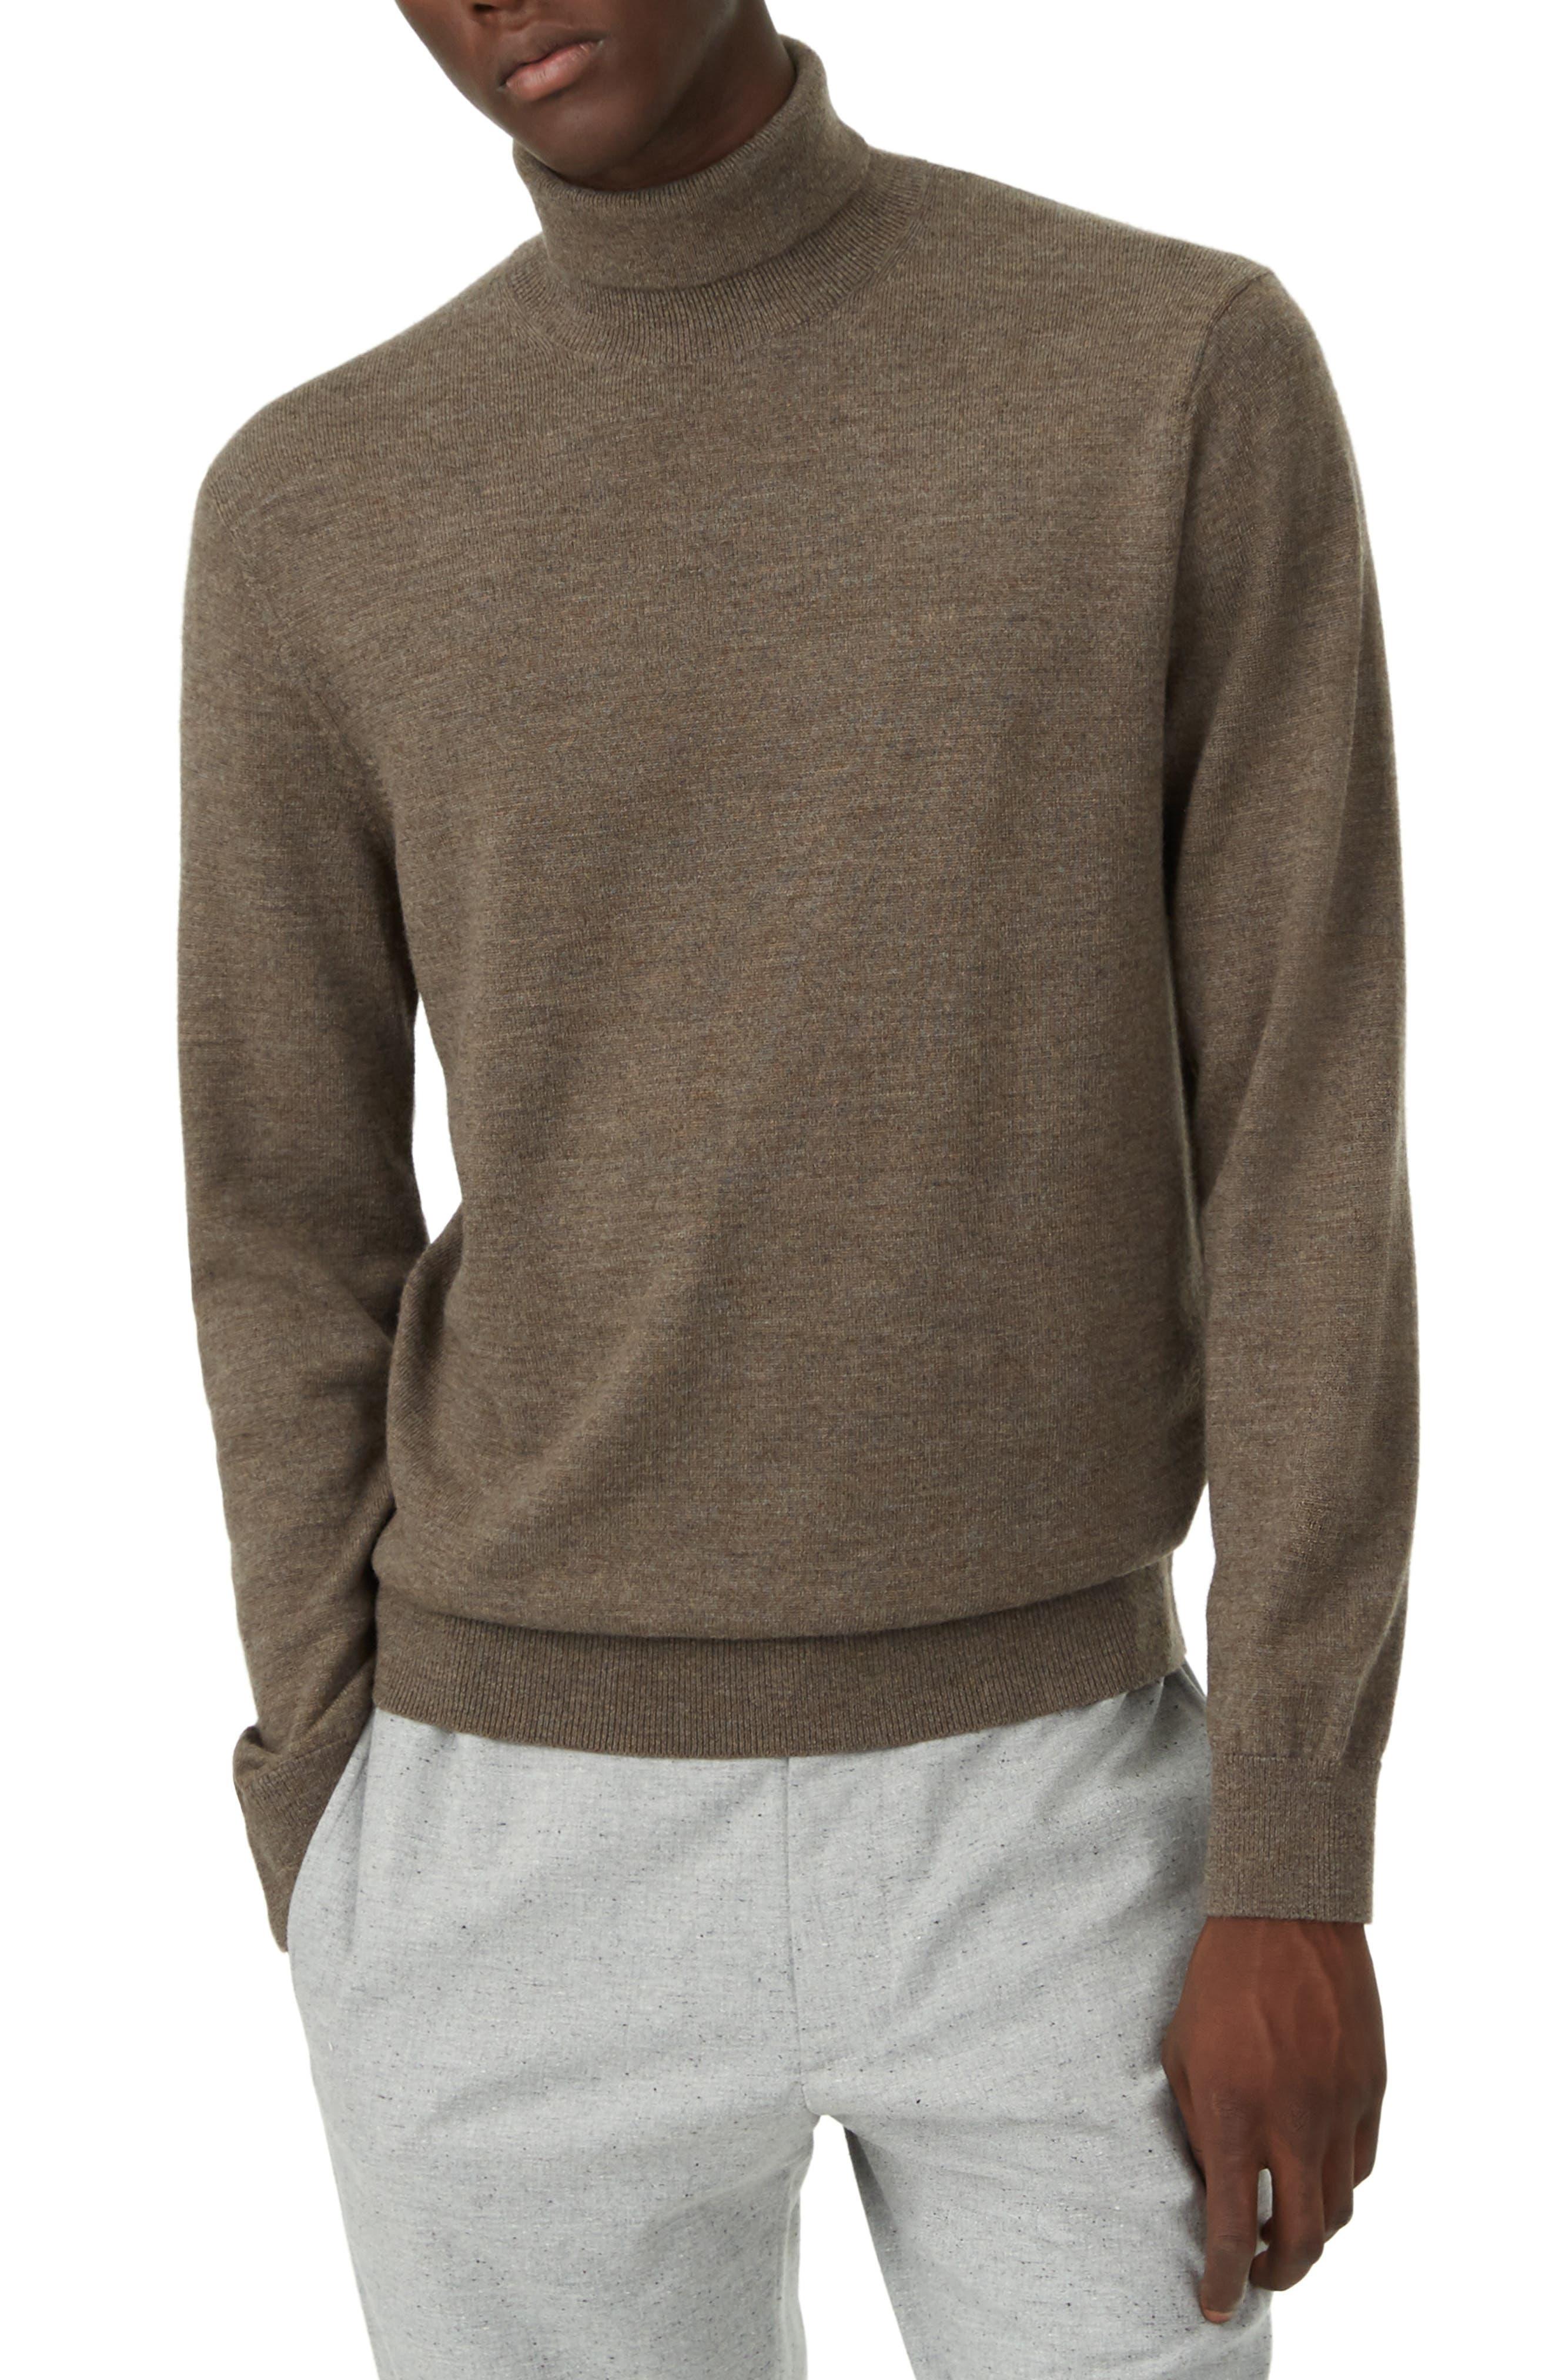 Club Monaco Trim Fit Merino Wool Turtleneck Sweater, Brown